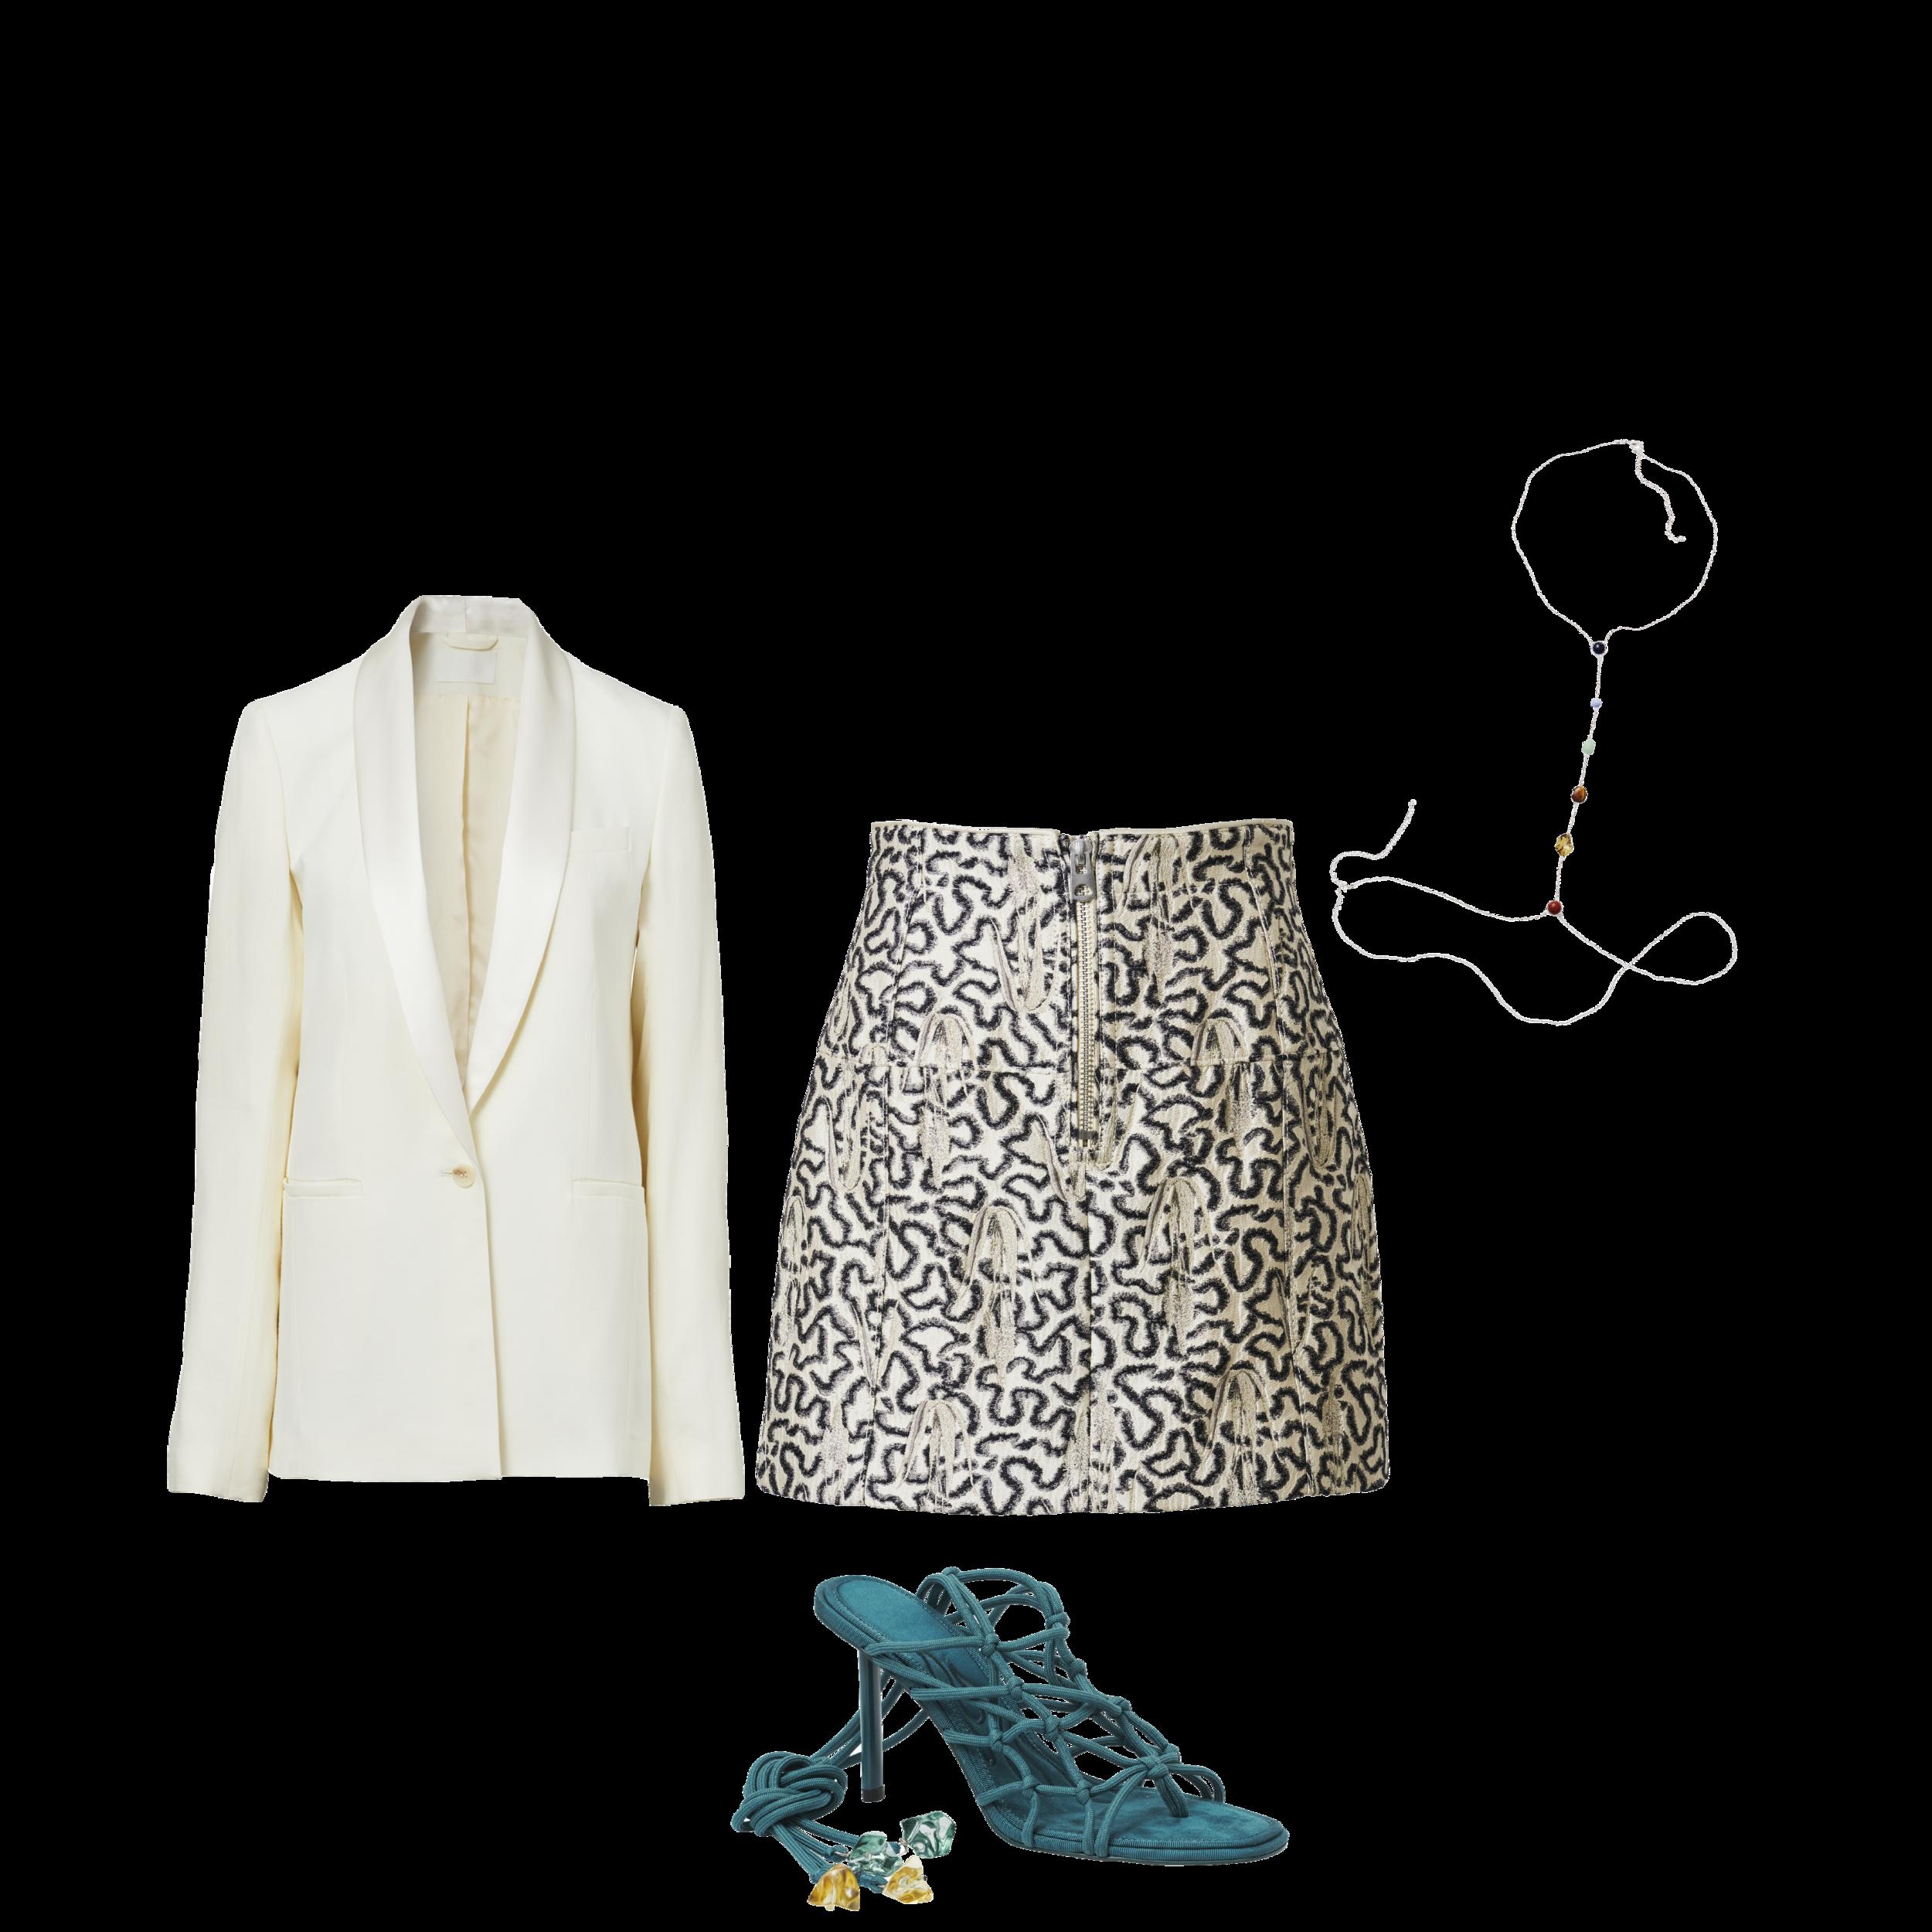 Blazer - RM 549.95 Printed Skirt - RM 279.95 (2) Strappy Heels - RM 374.95